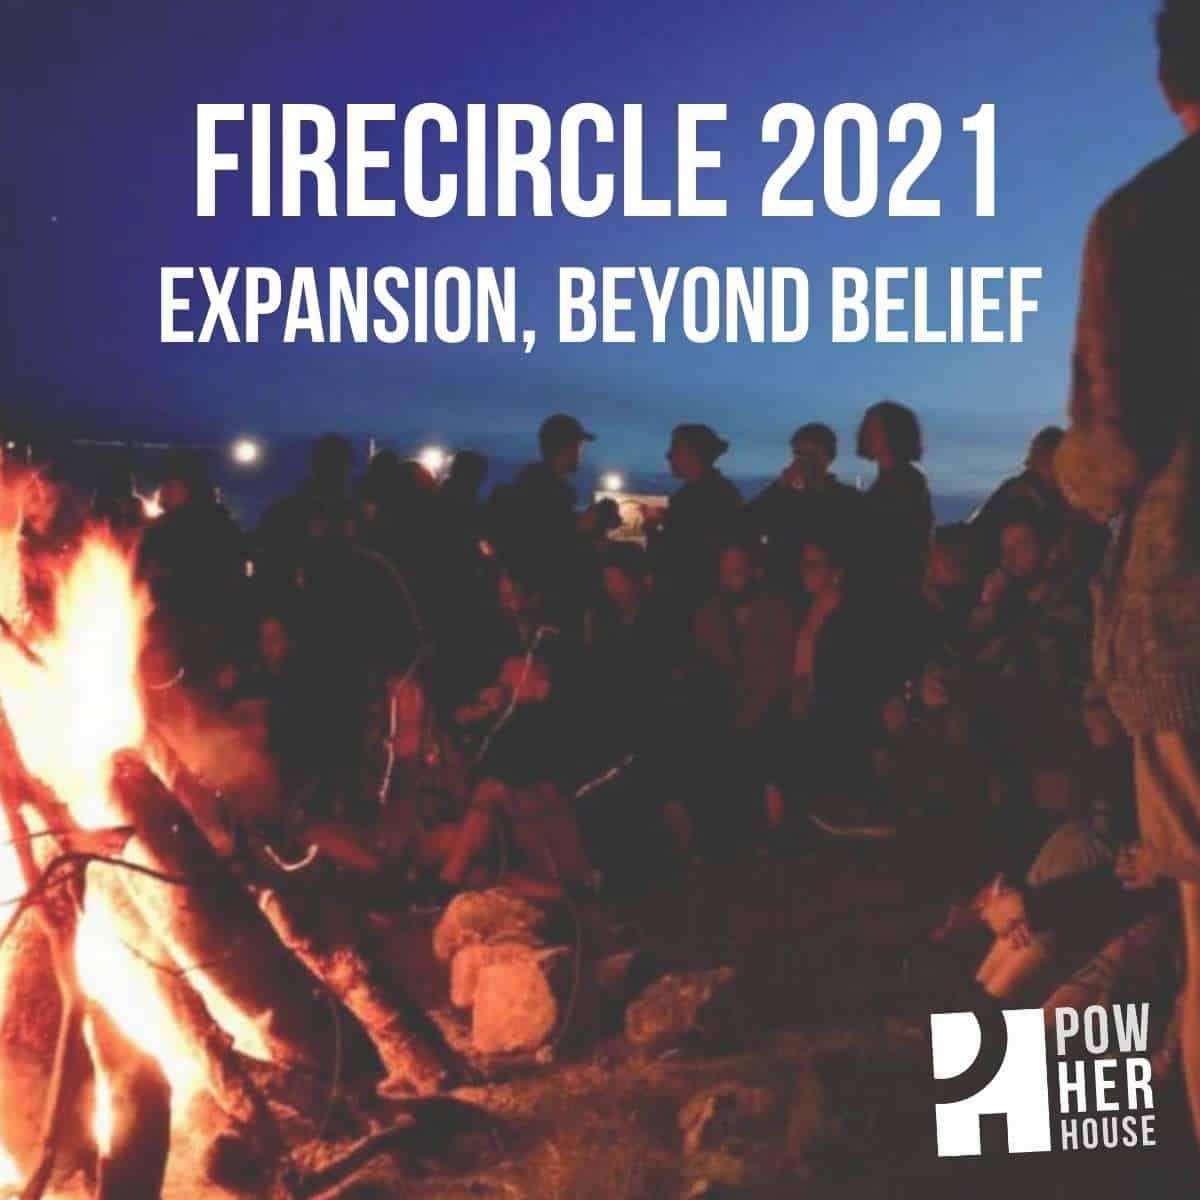 FireCircle 2021